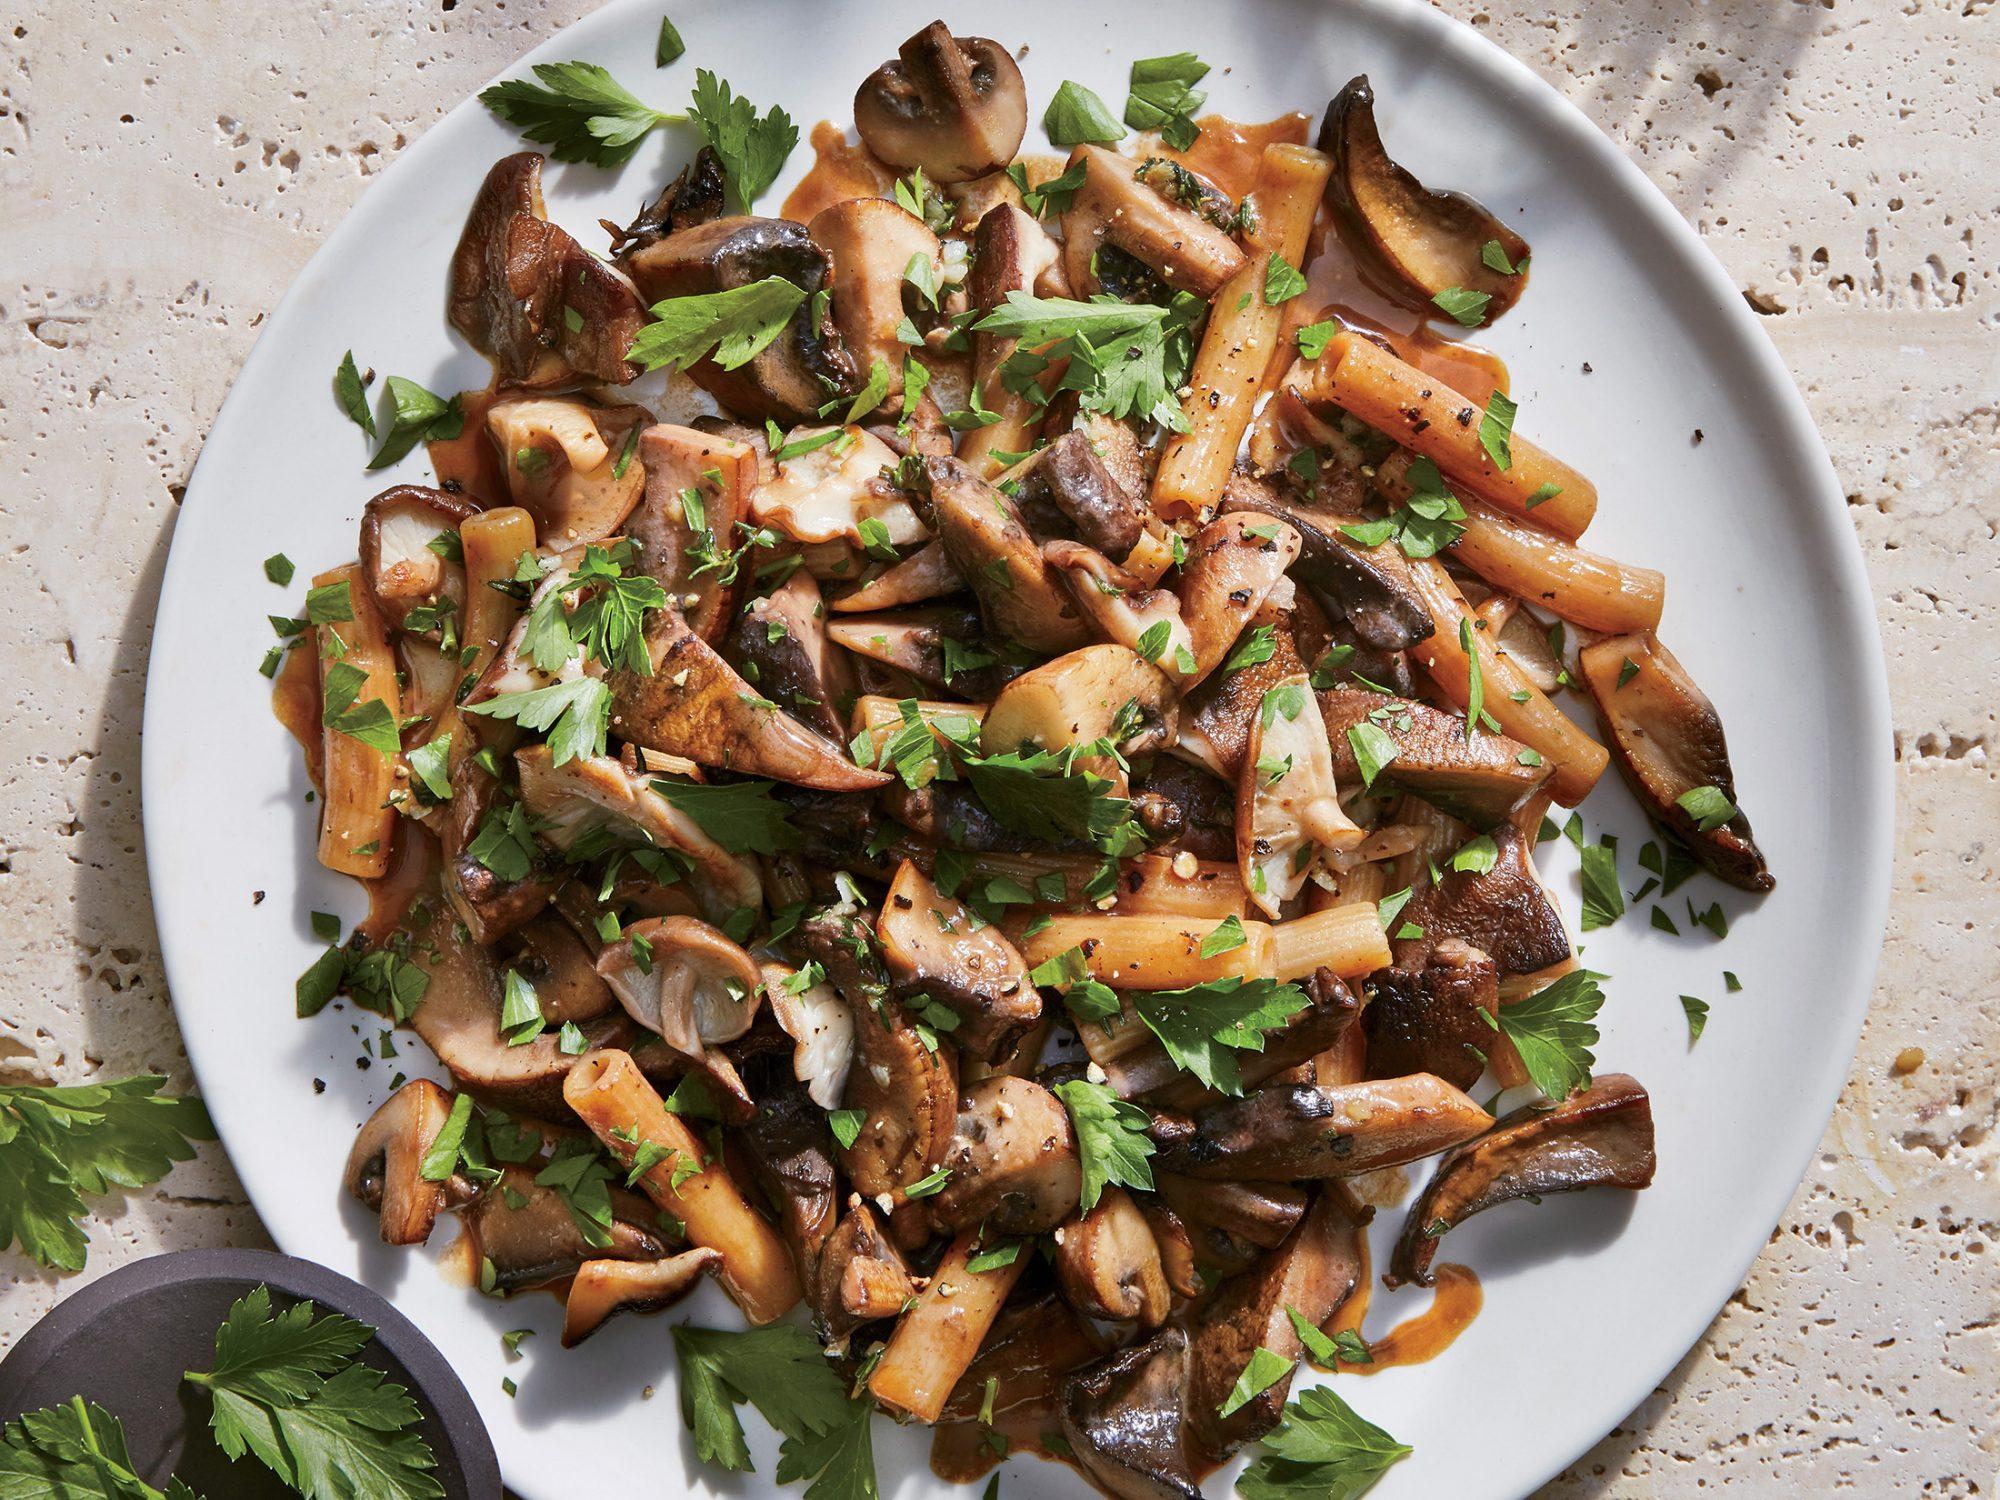 50 Mushroom Recipes We Love